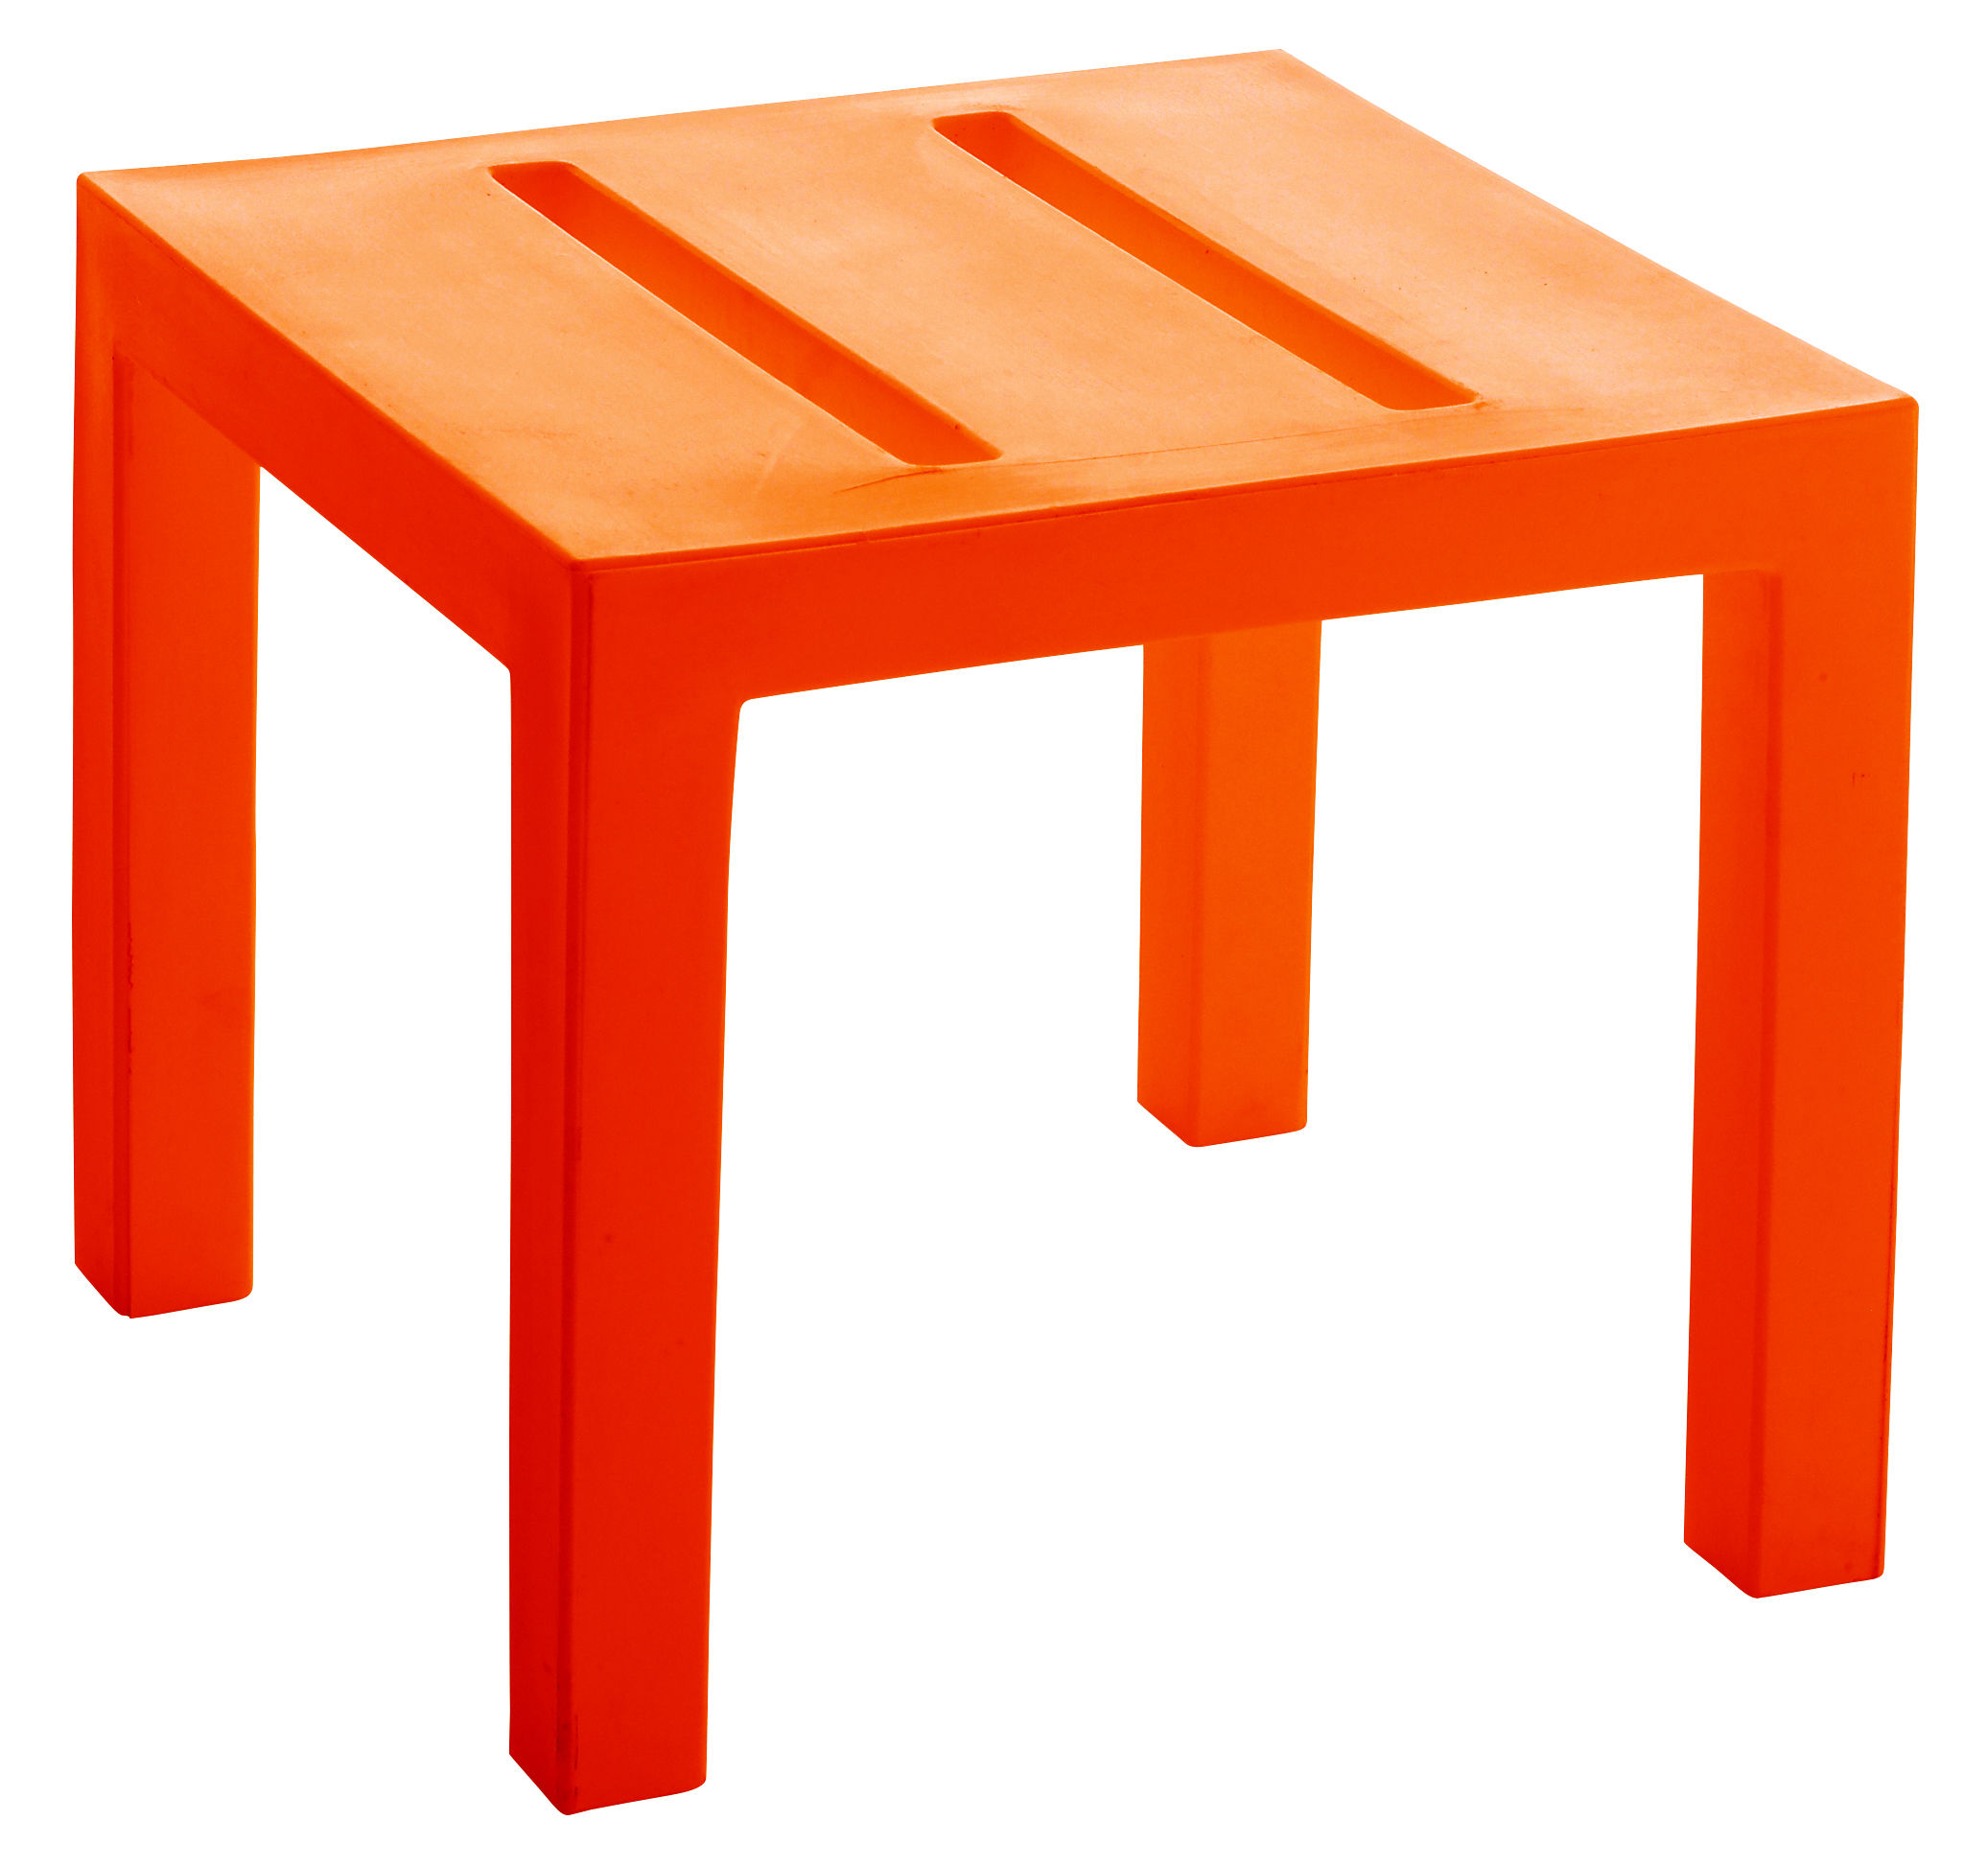 Handy Coffee Table Matt Version Matt Orange By